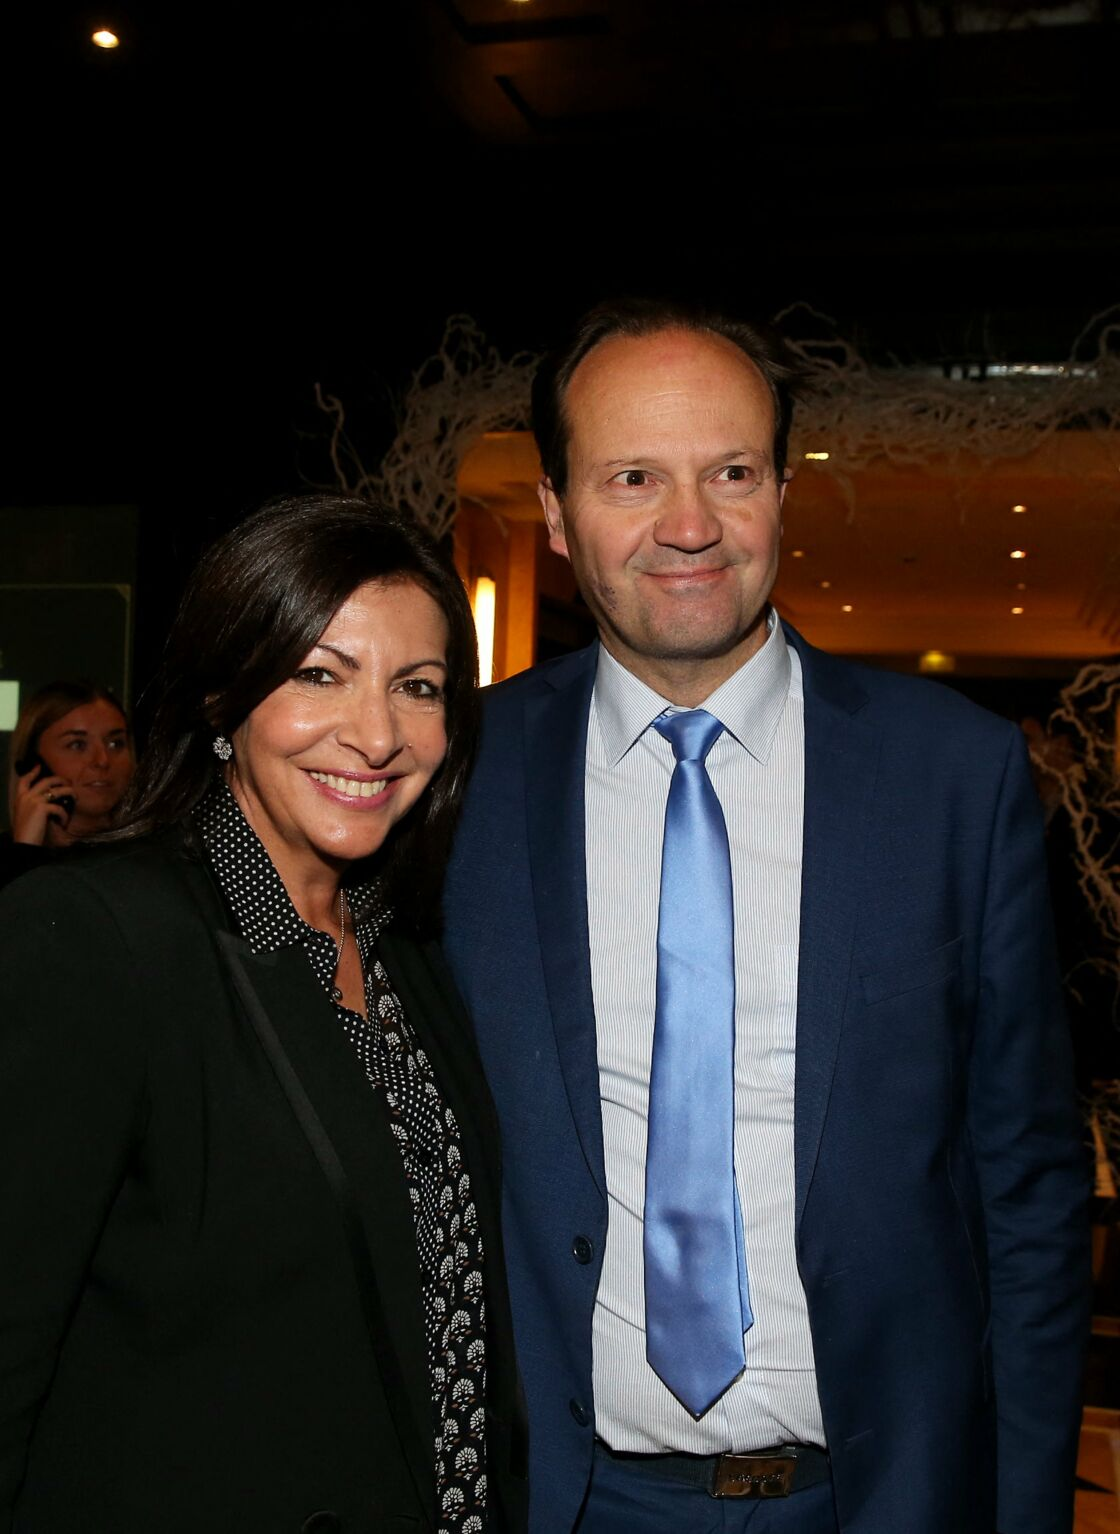 Anne Hidalgo et Jean-Marc Germain en 2019